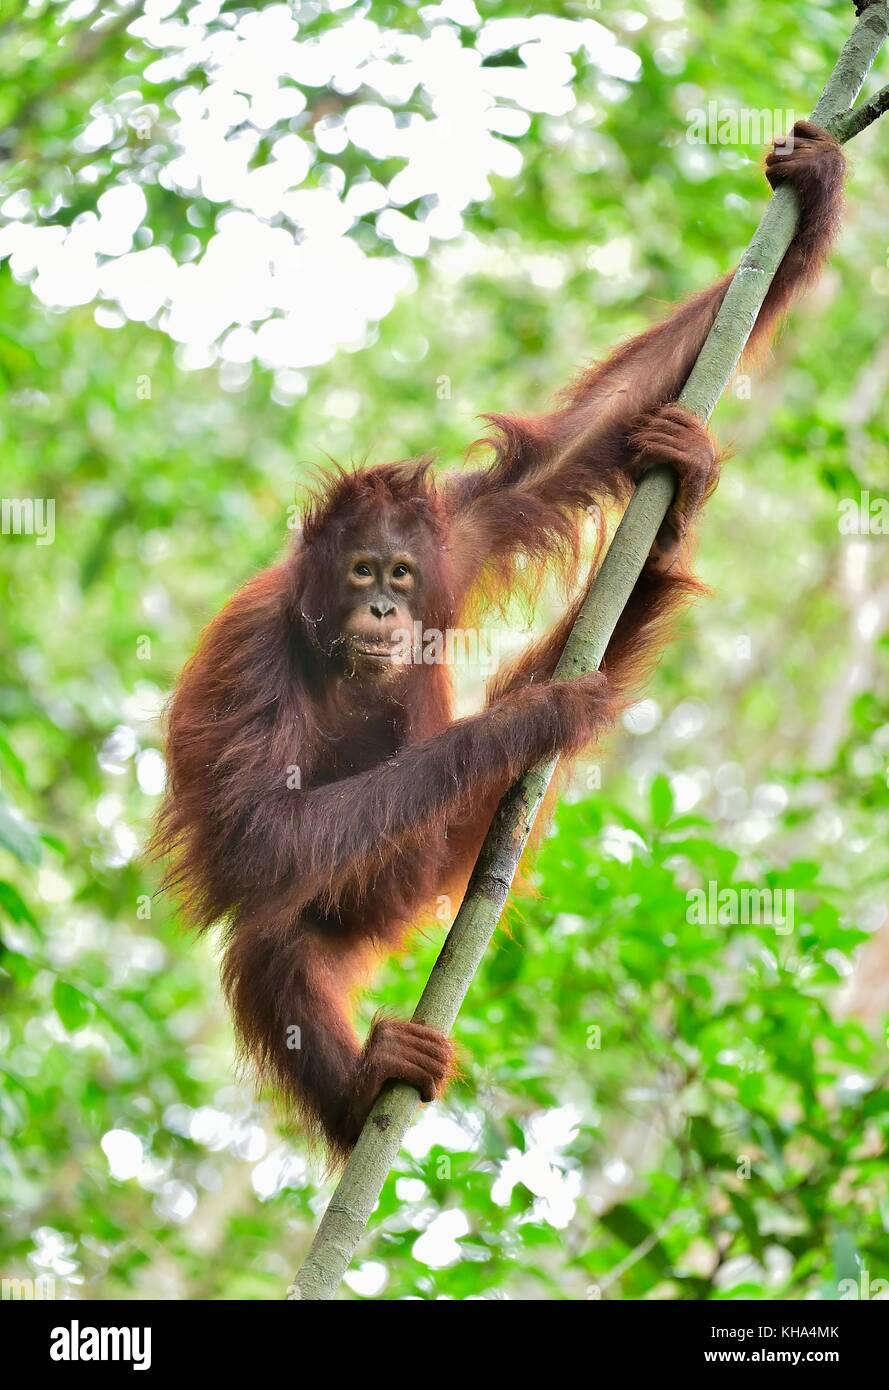 Central Bornean orangutan ( Pongo pygmaeus wurmbii ) on the tree in natural habitat. Wild nature in Tropical Rainforest - Stock Image